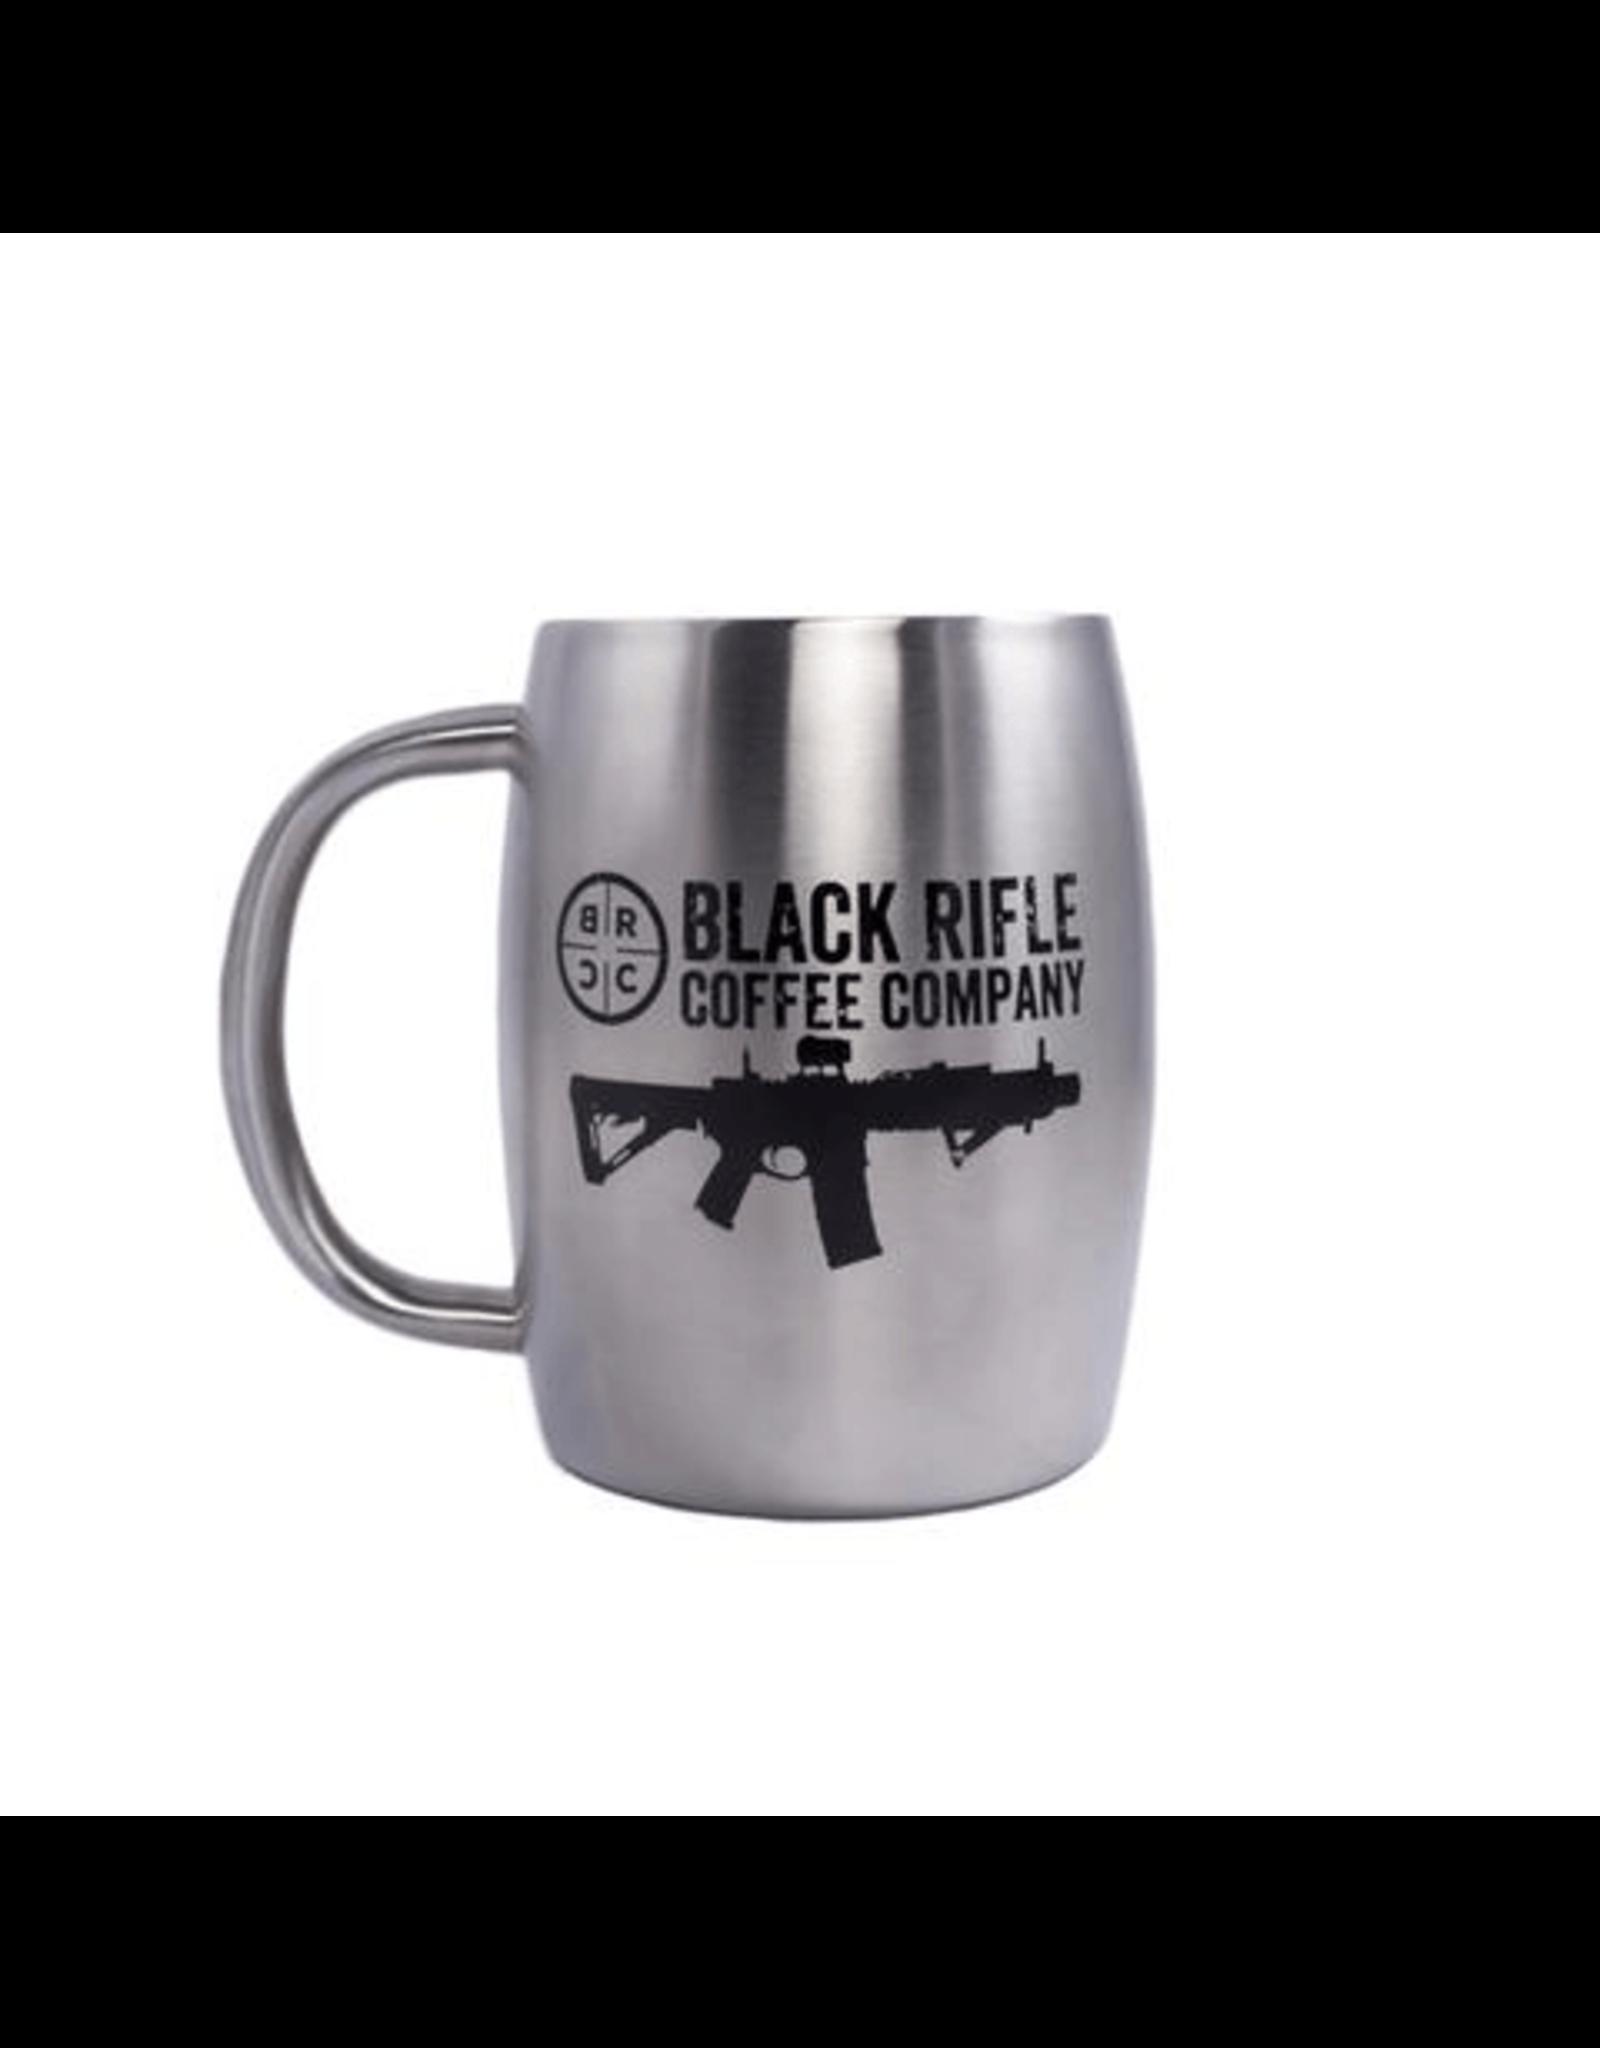 BRCC - Mug -  Stainless Steel - Stainless